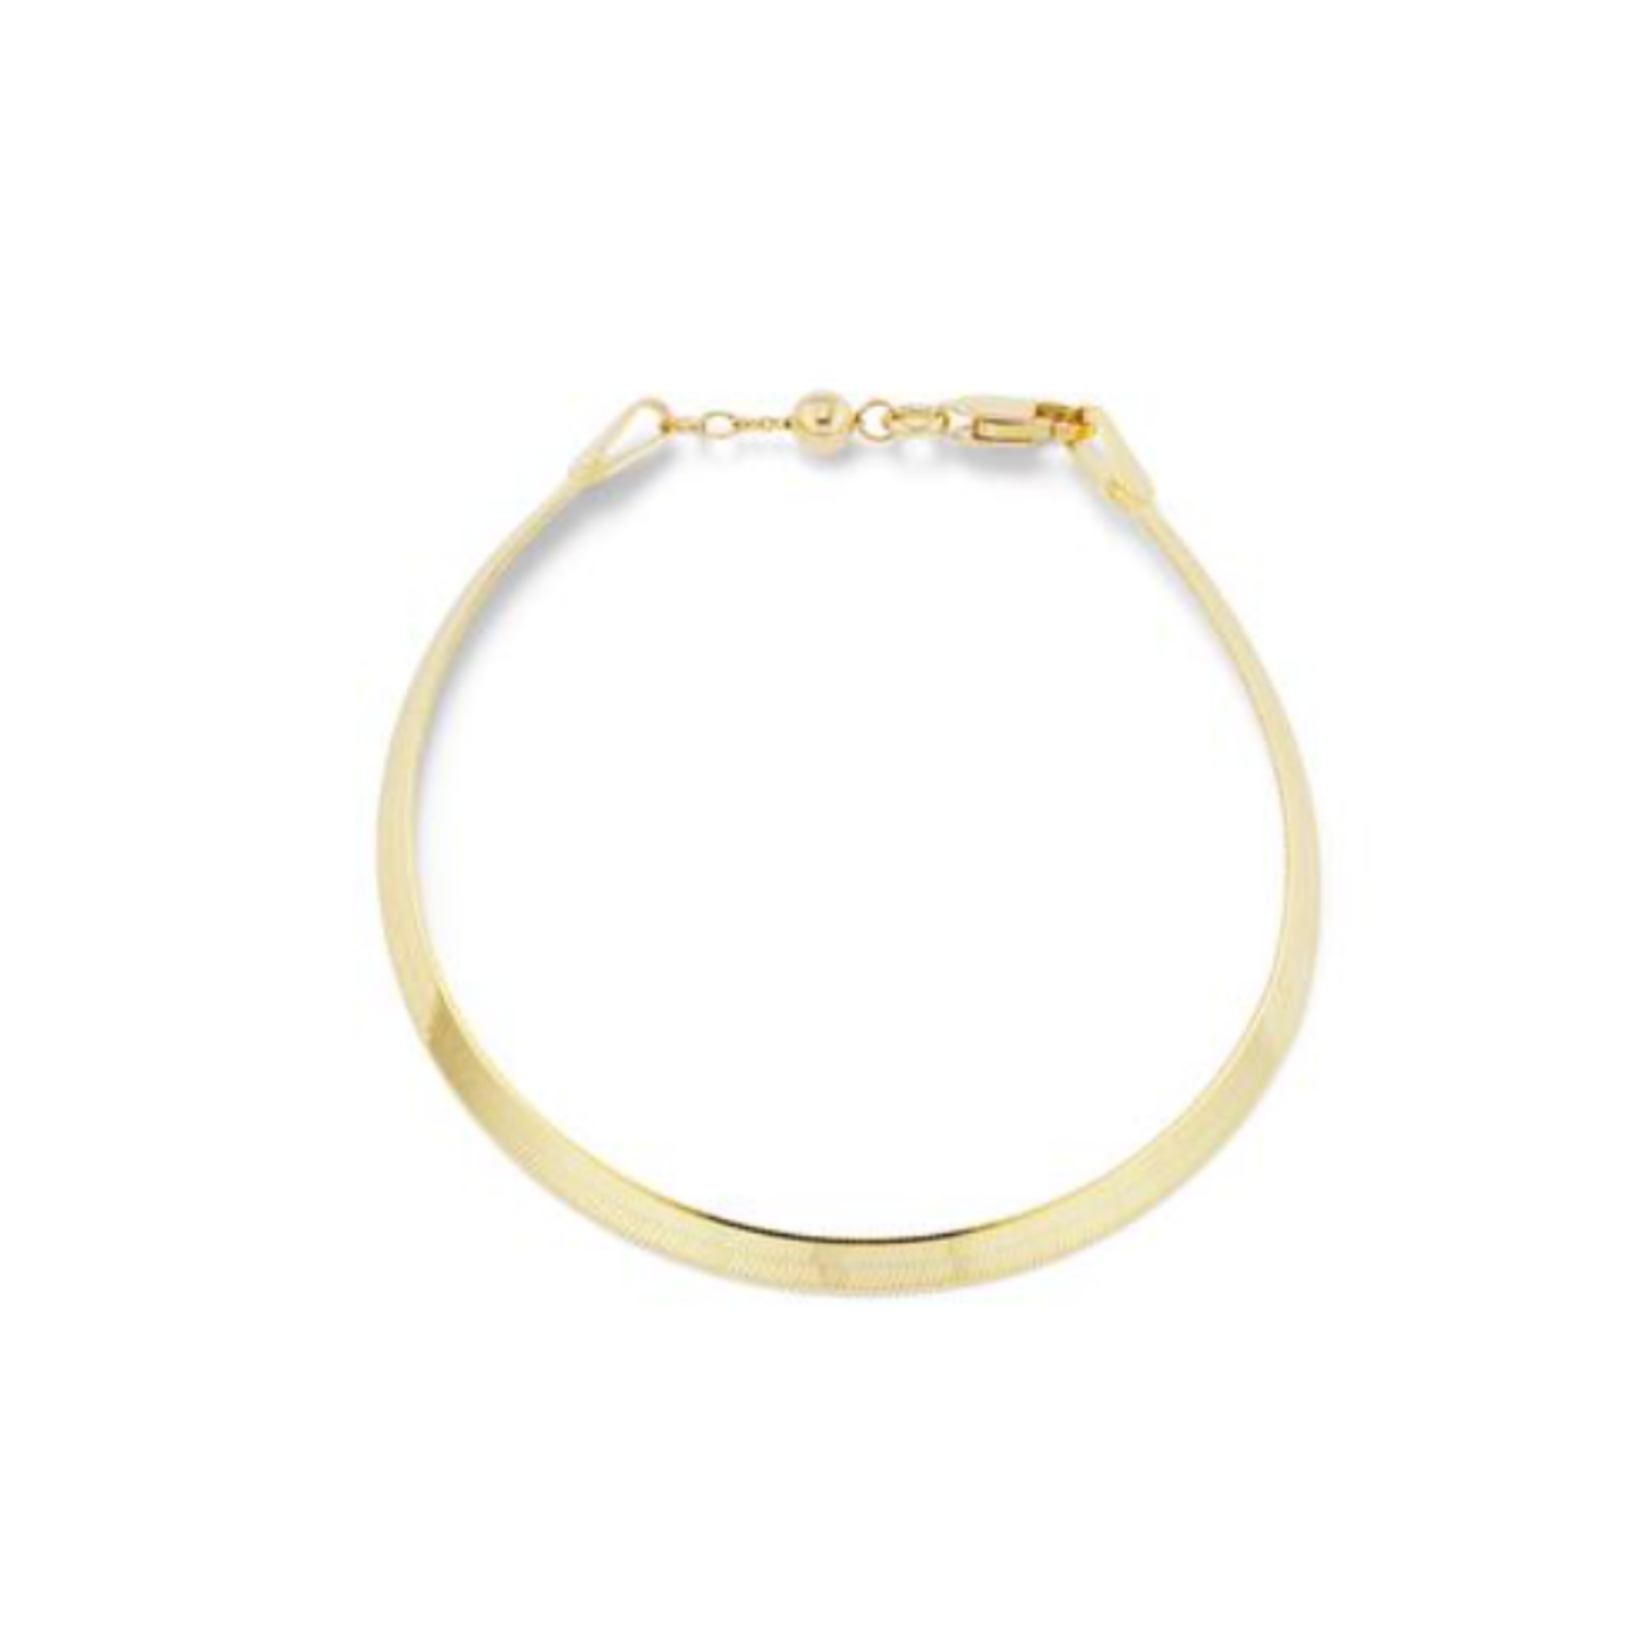 KBH Jewels Liquid Gold Herringbone Anklet